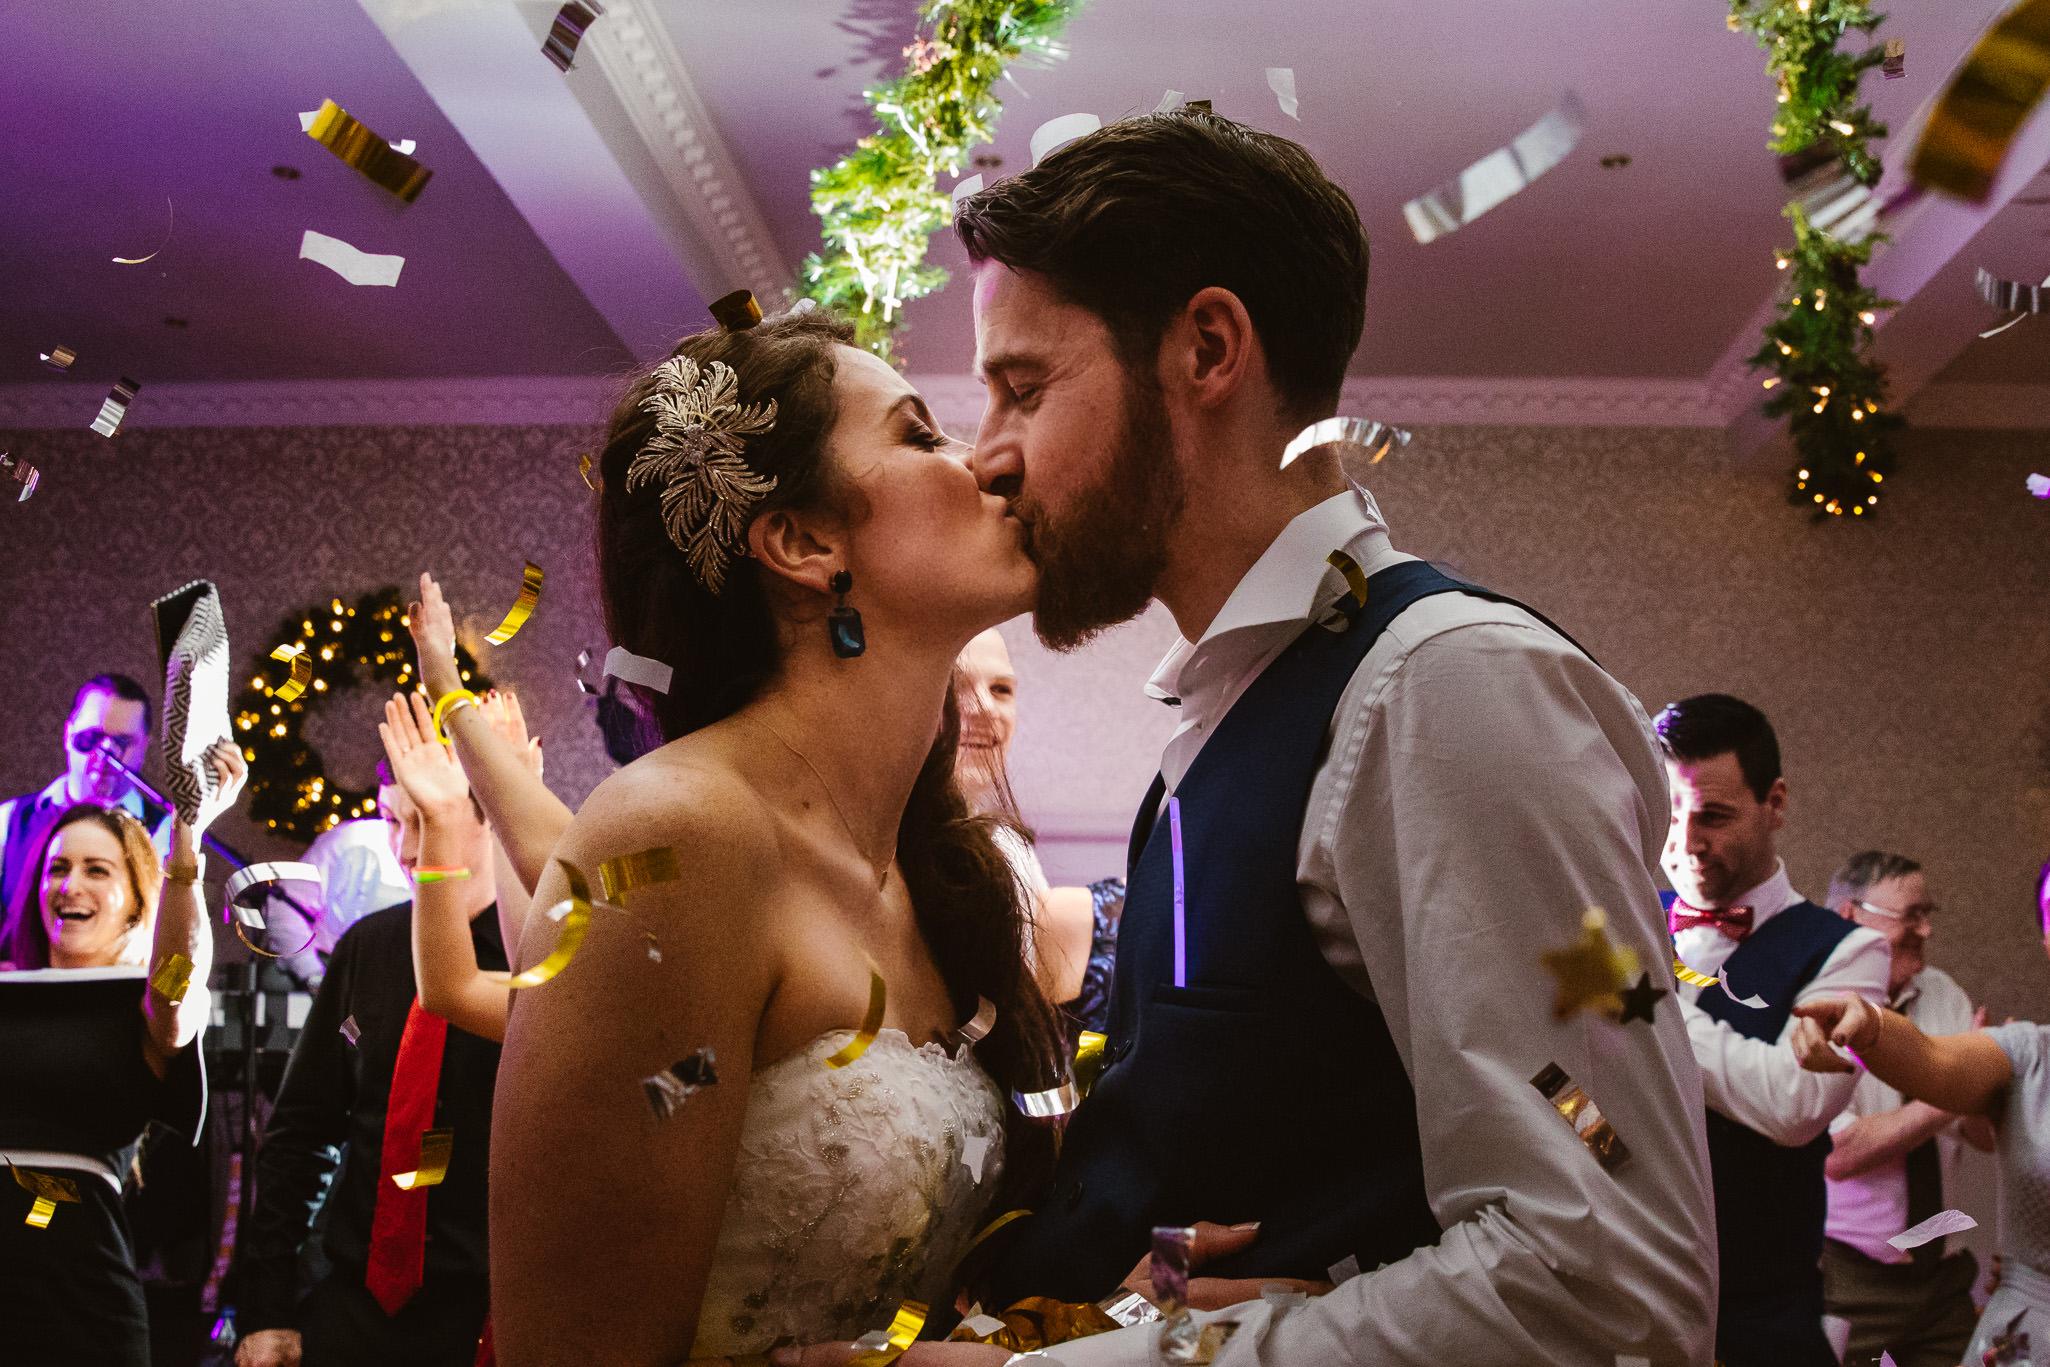 clairebyrnephotography-wedding-night-sparklers-new-years-eve-denyce-leonard-31.jpg